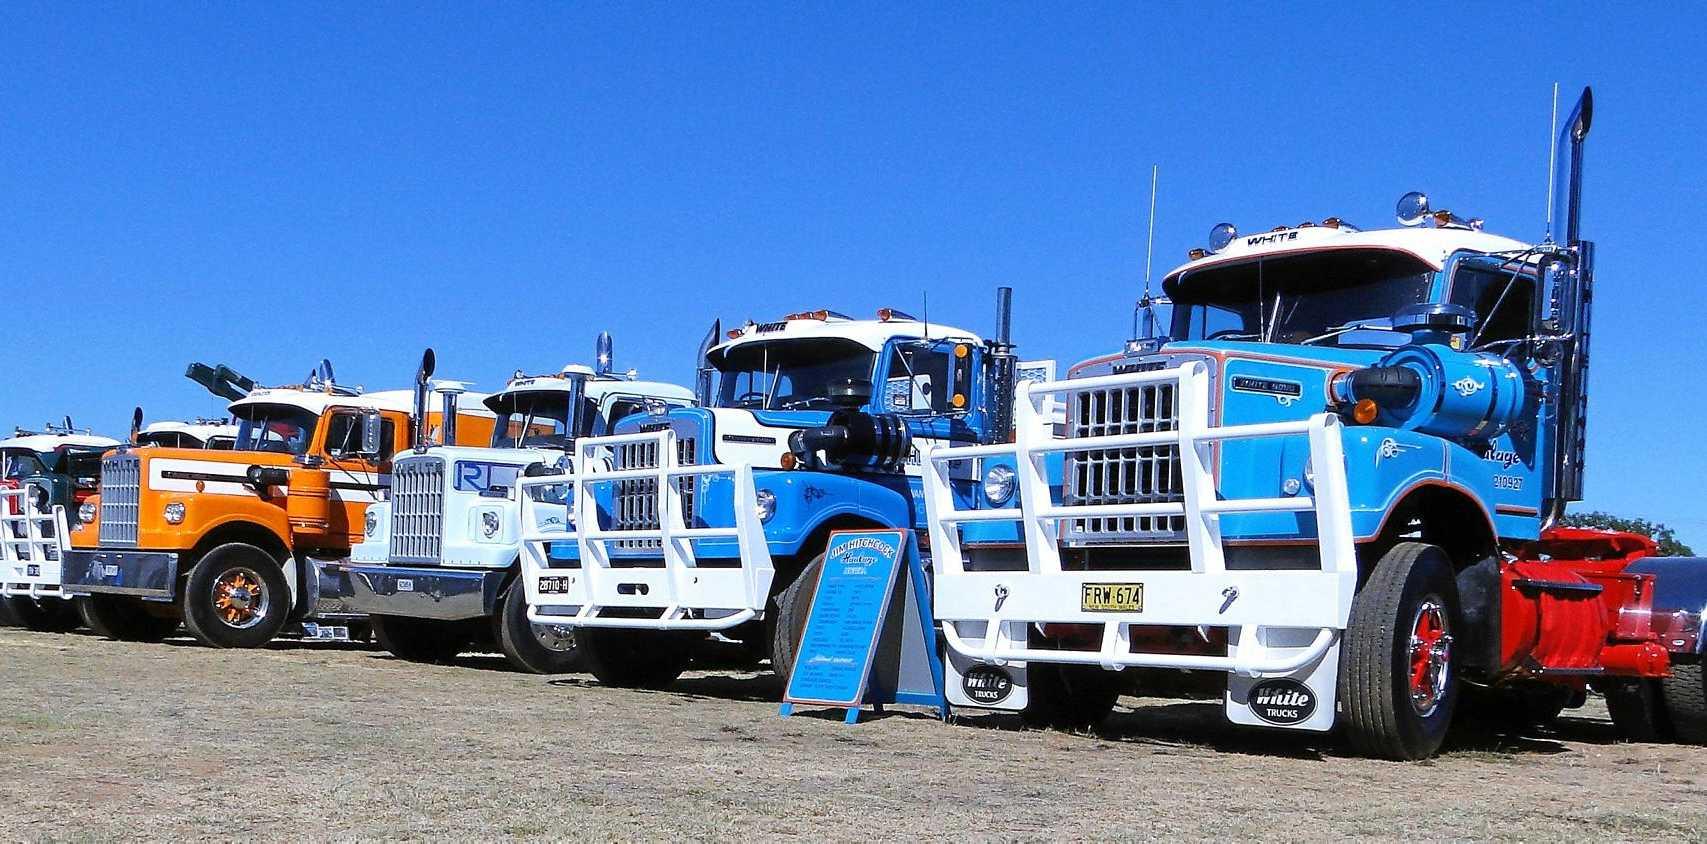 The White trucks line up.